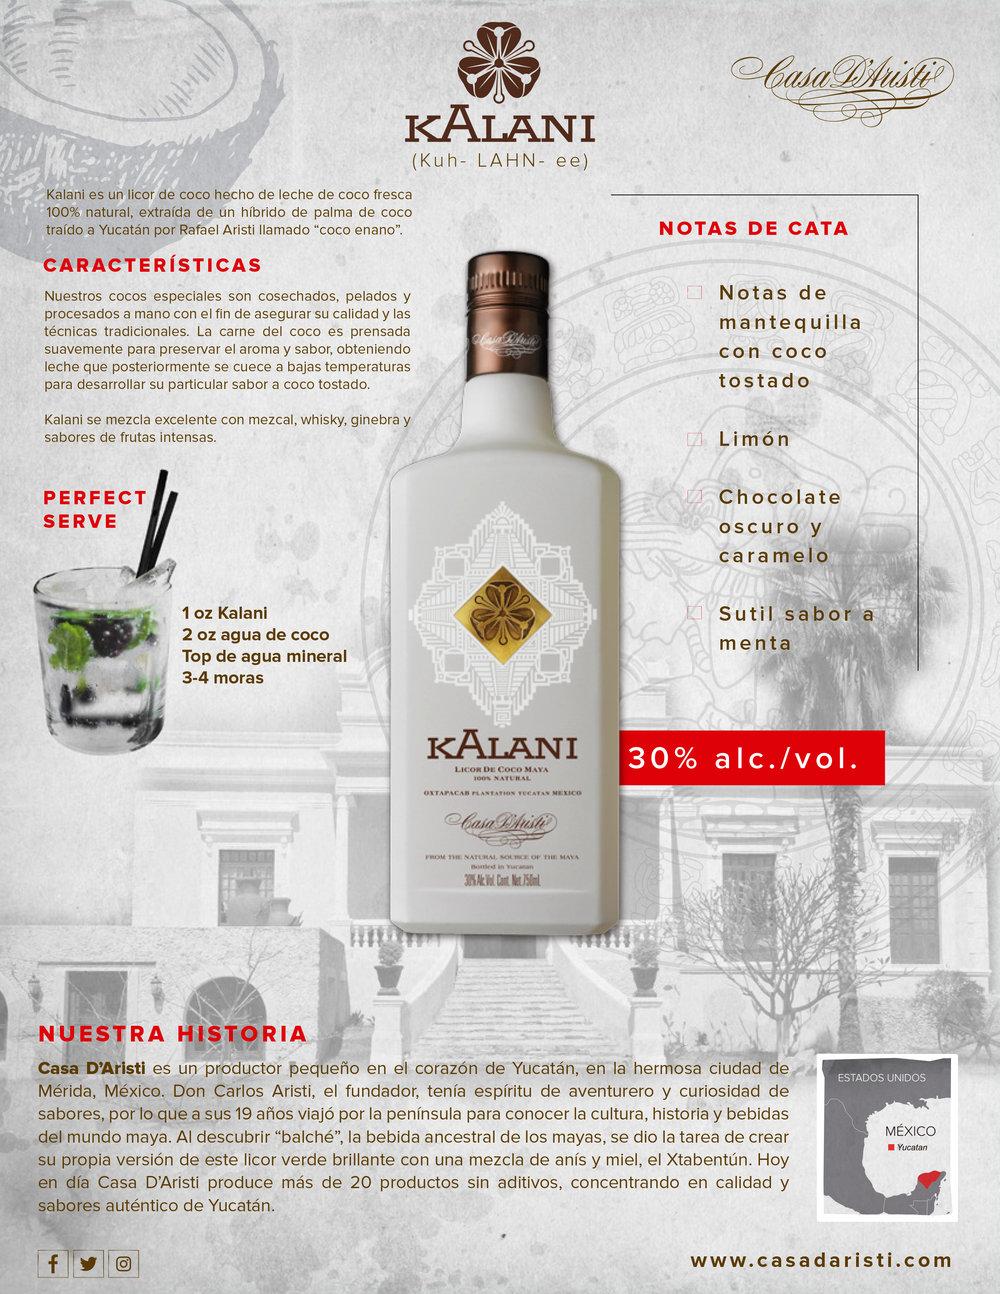 Kalani Casa D'Aristi Coconut licor